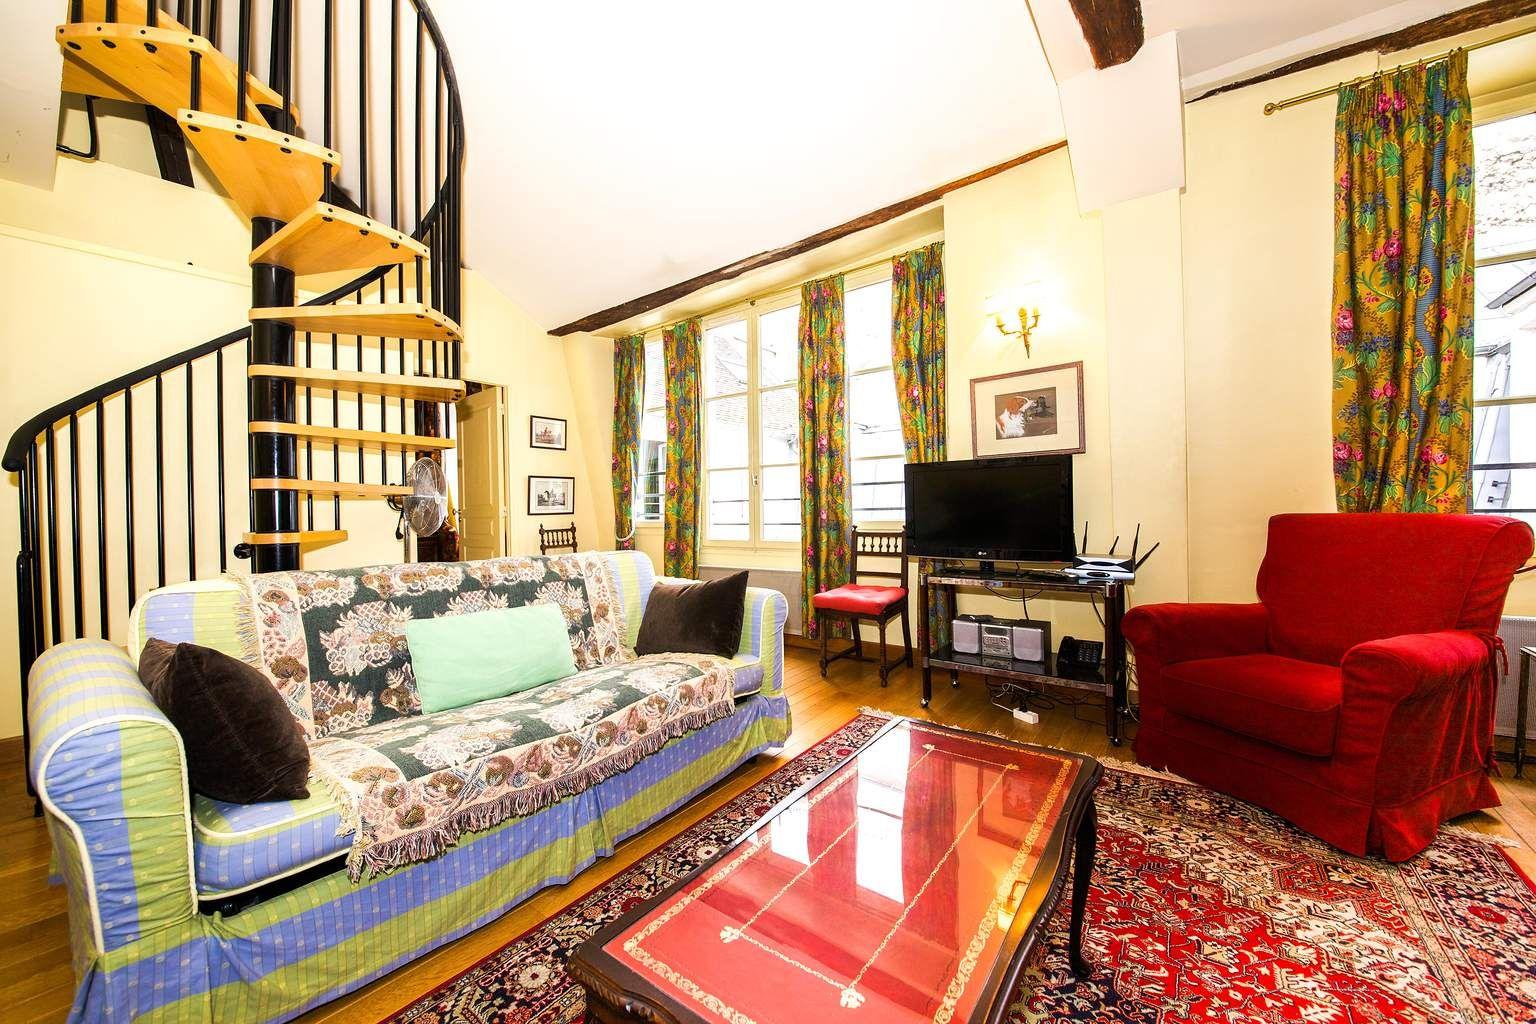 rue victor cousin   paris   rental 1-bedroom duplex apartment